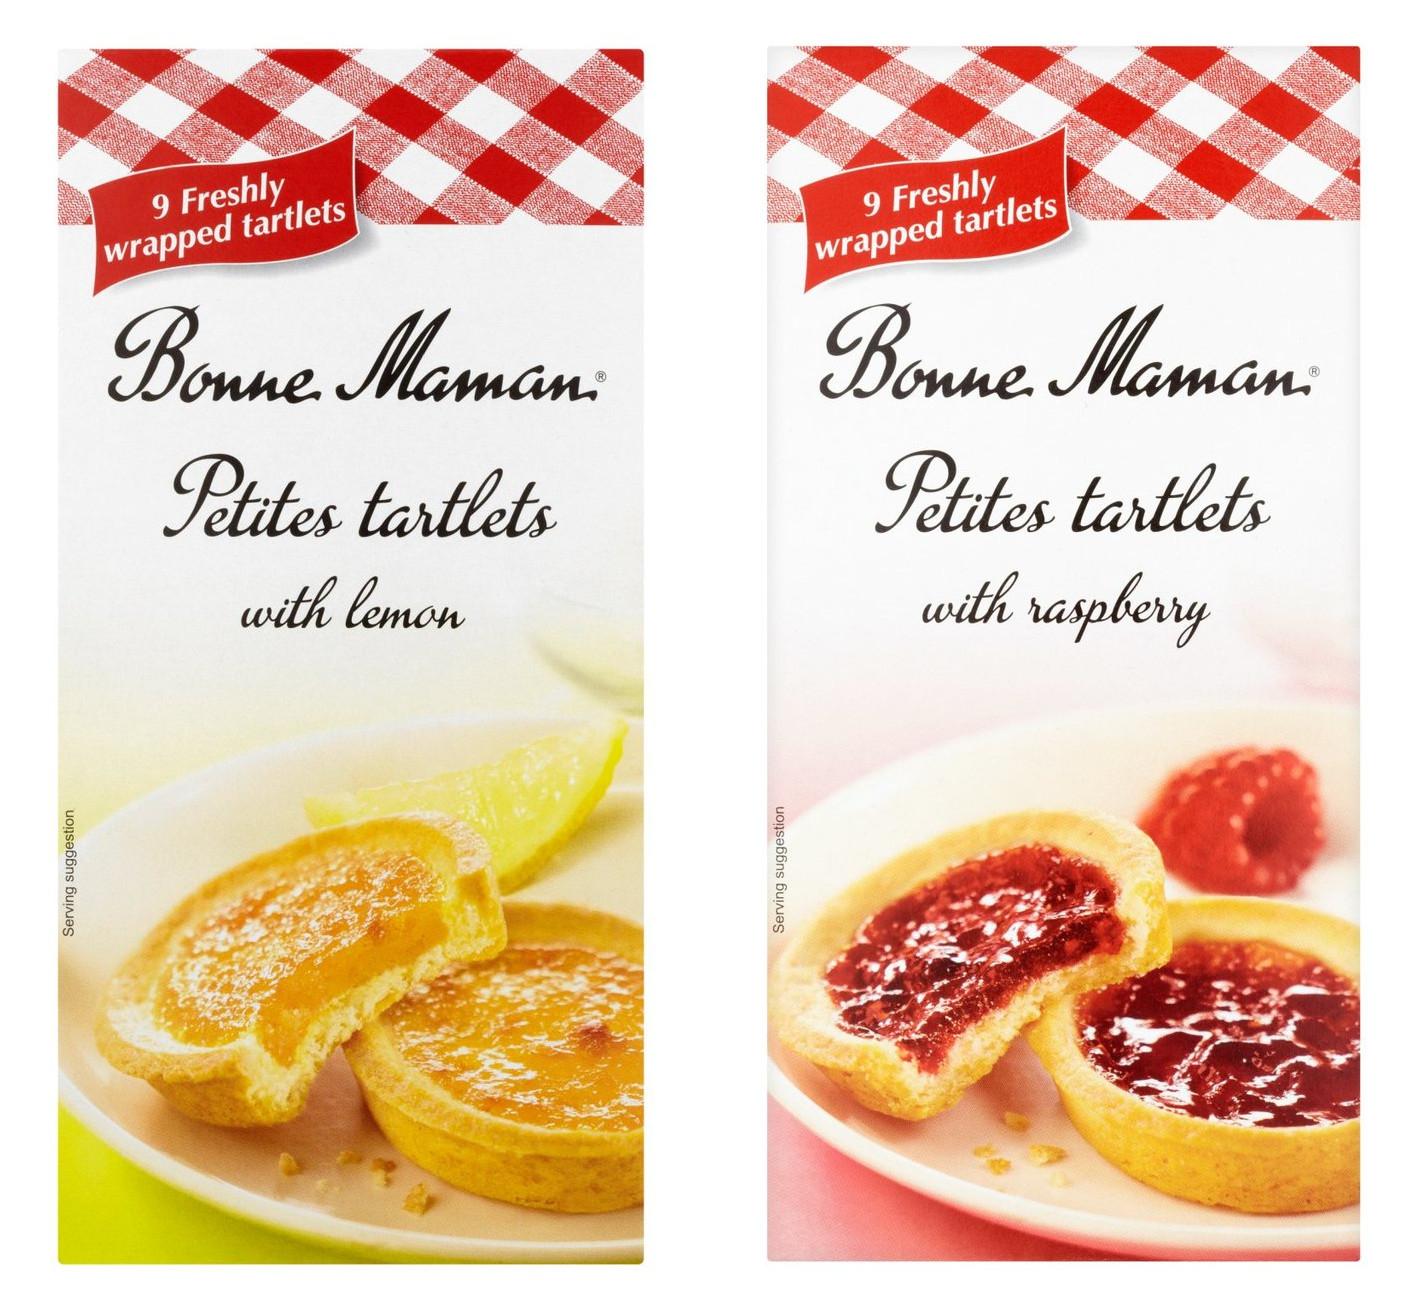 Bonne Maman Petites Tartlets With Lemon or Raspberry 9 Freshly Wrapped Tartlets - 75p @ Morrisons